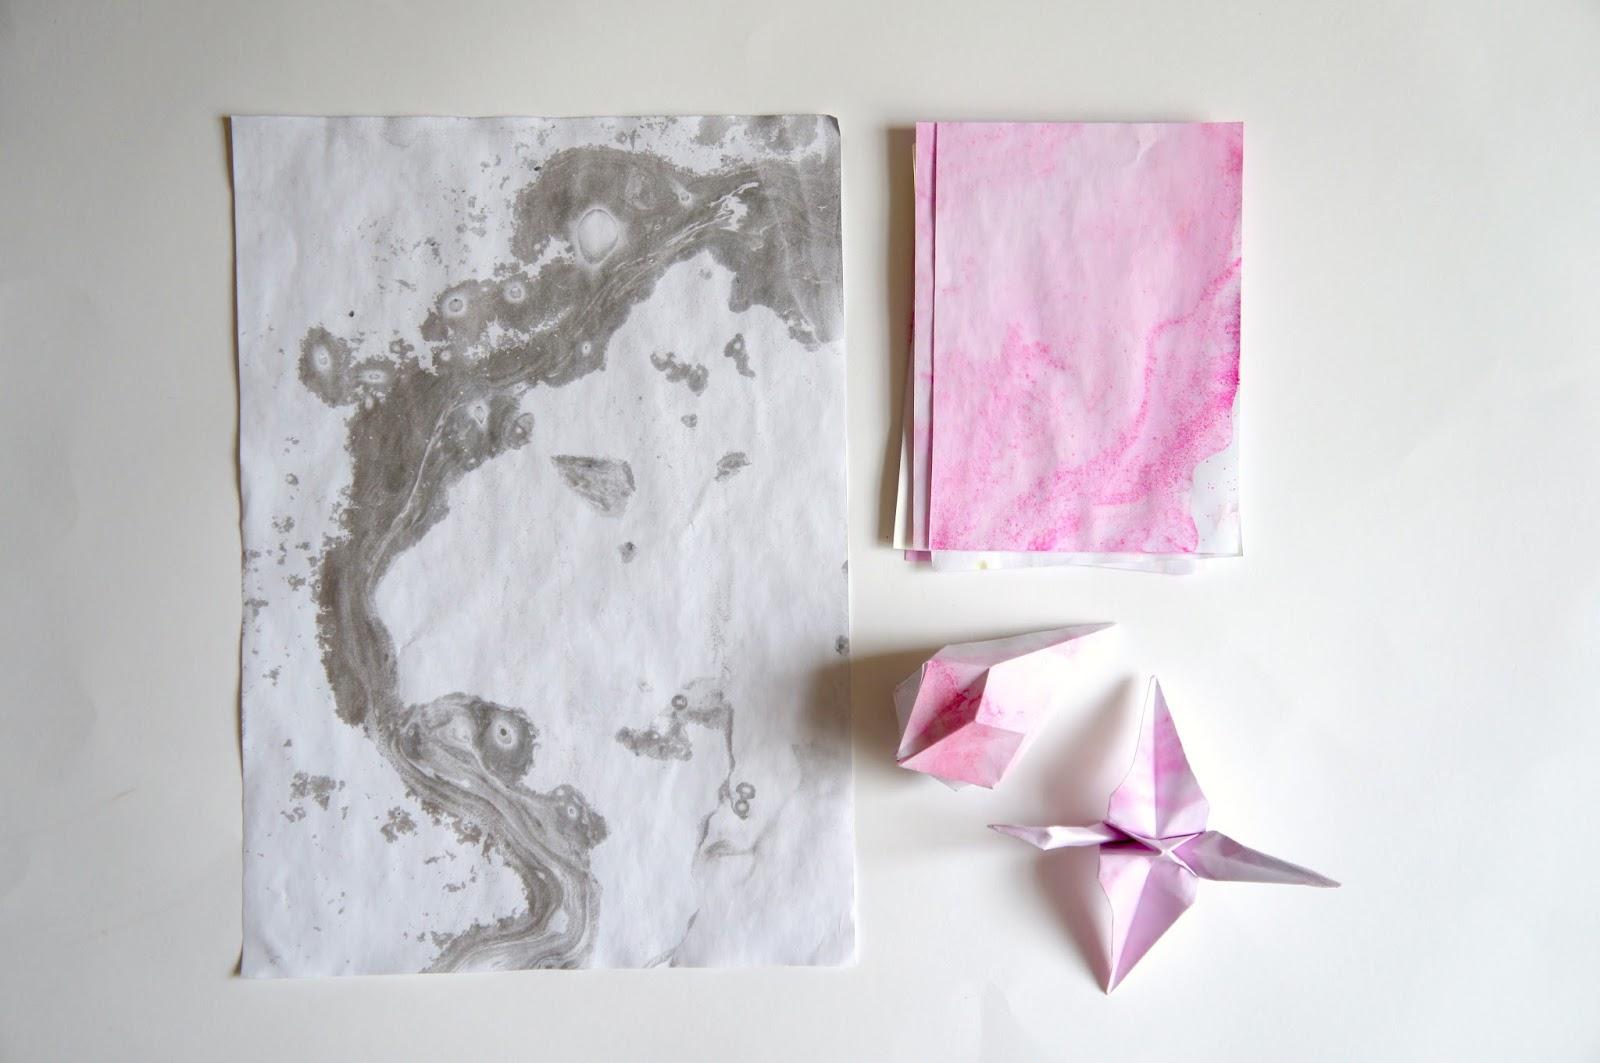 Diy Lush Bath Bomb Marble Paper Jessalli The Blog